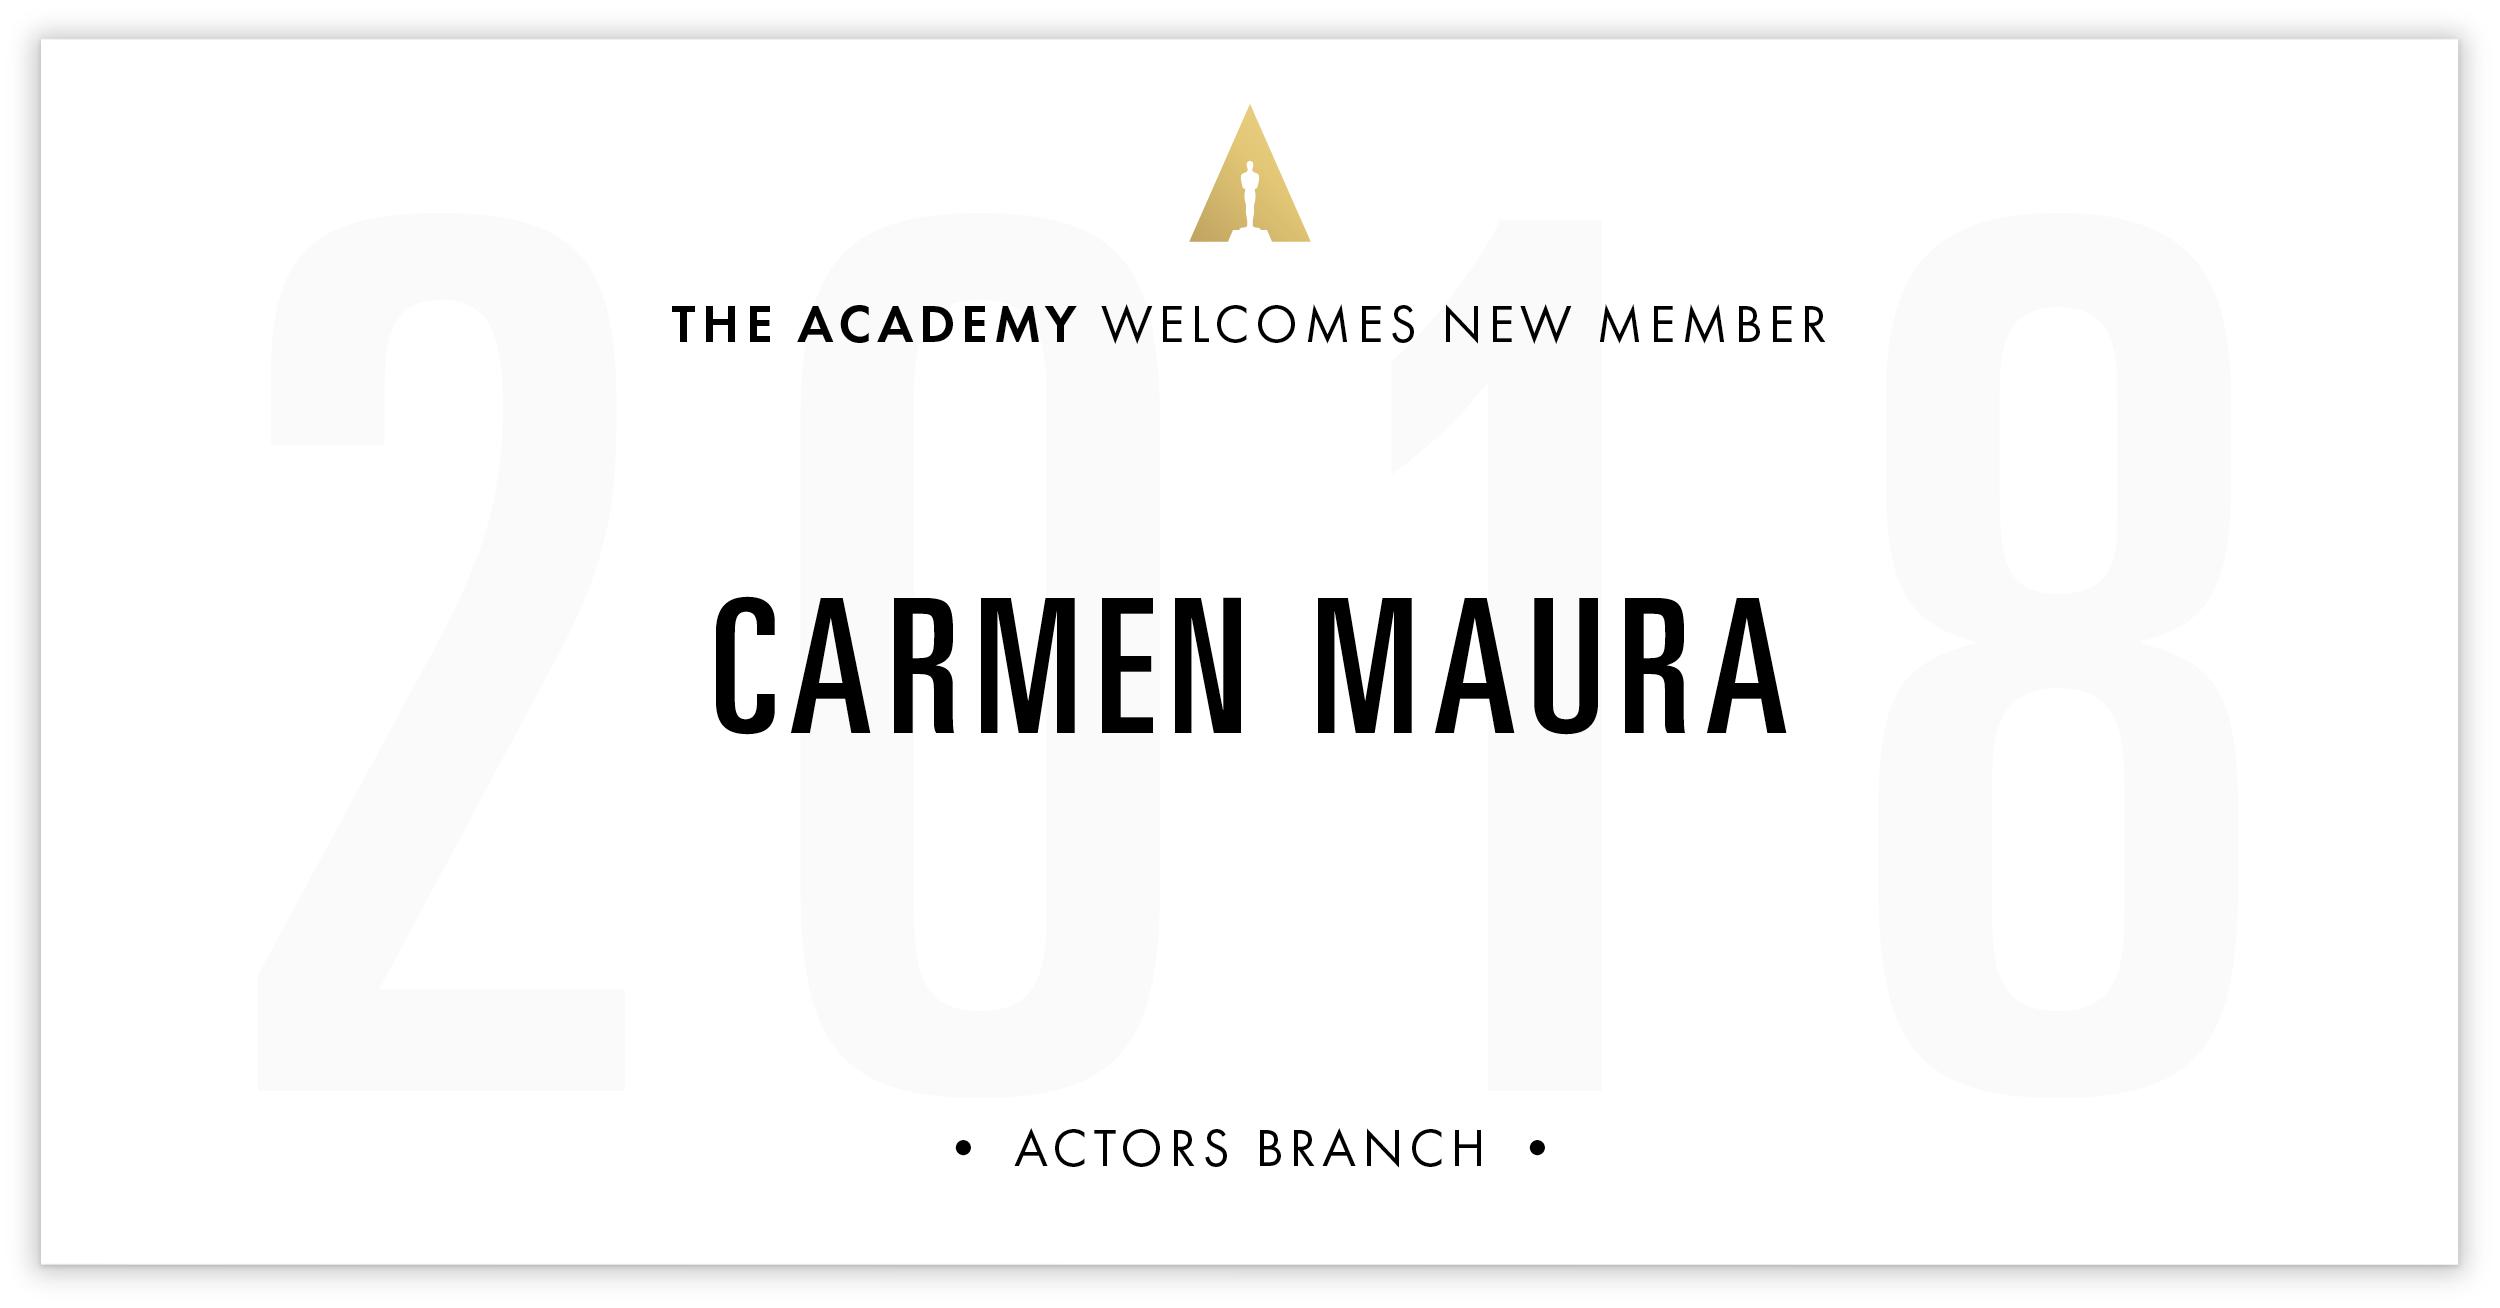 Carmen Maura is invited!